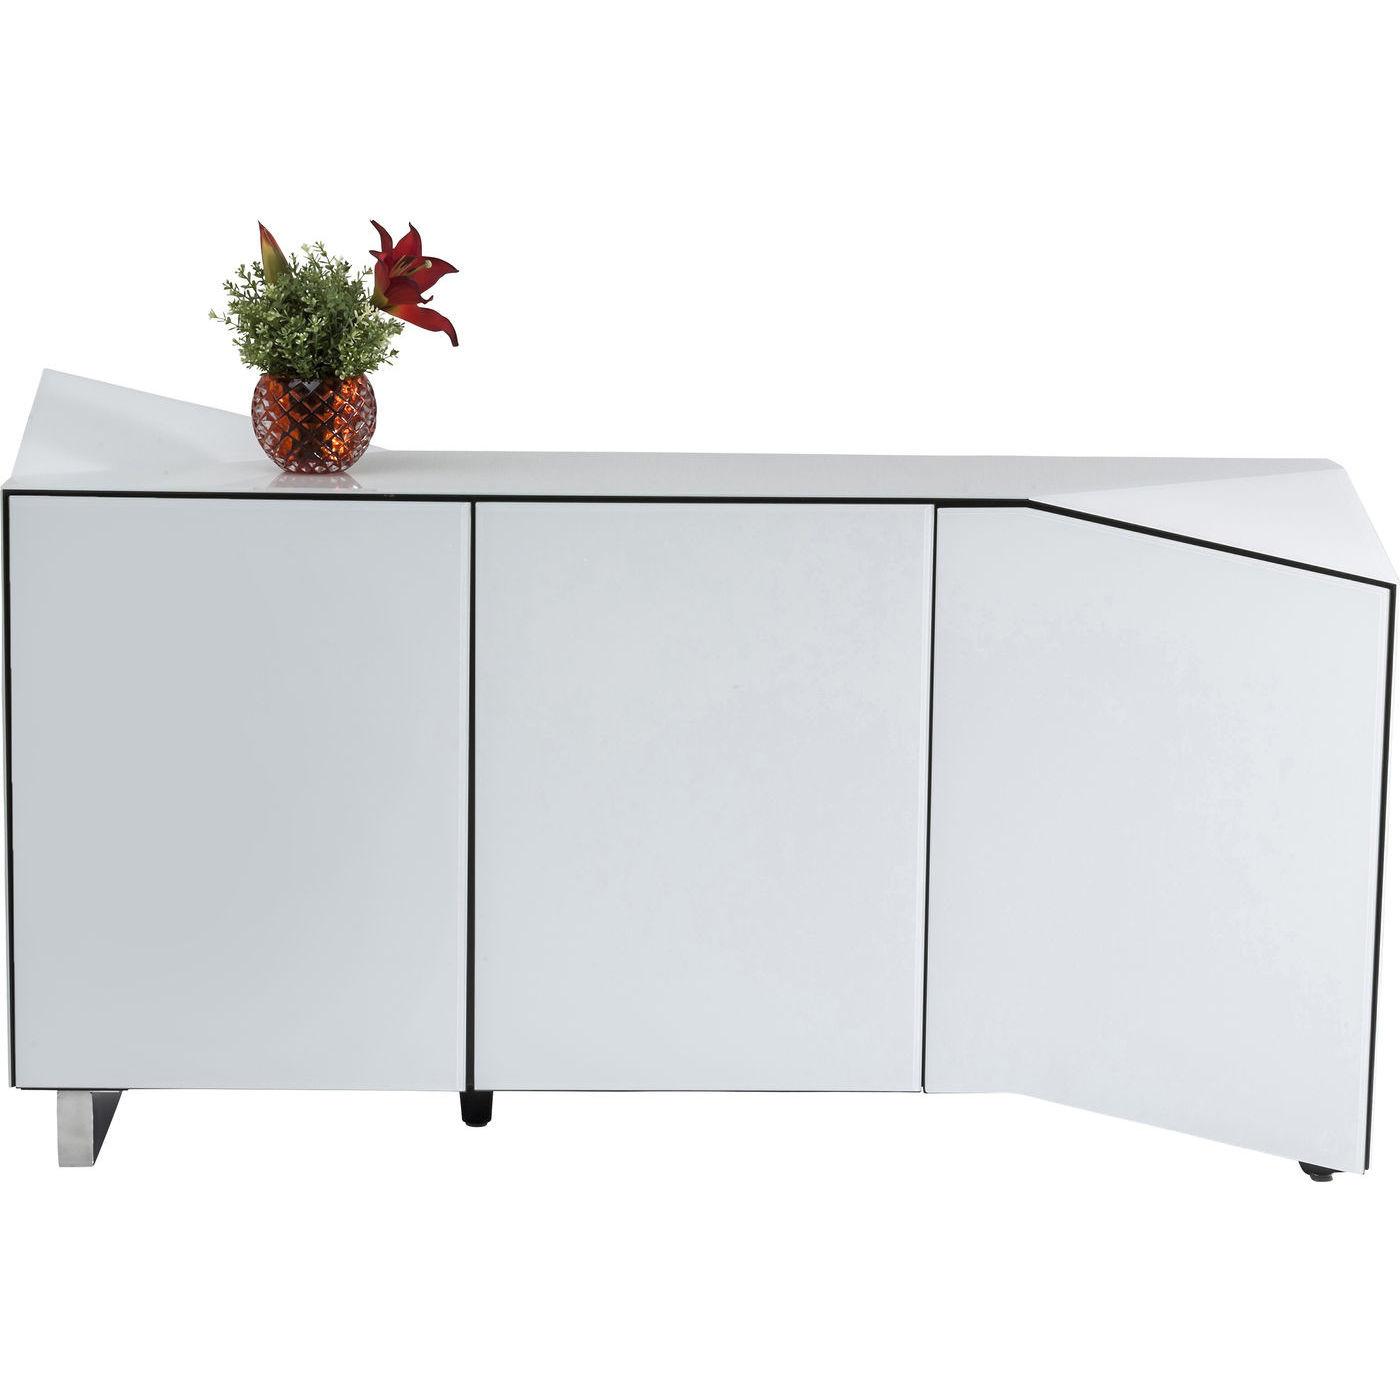 Sideboard triangle white kare design mutoni m bel for Kare design schweiz